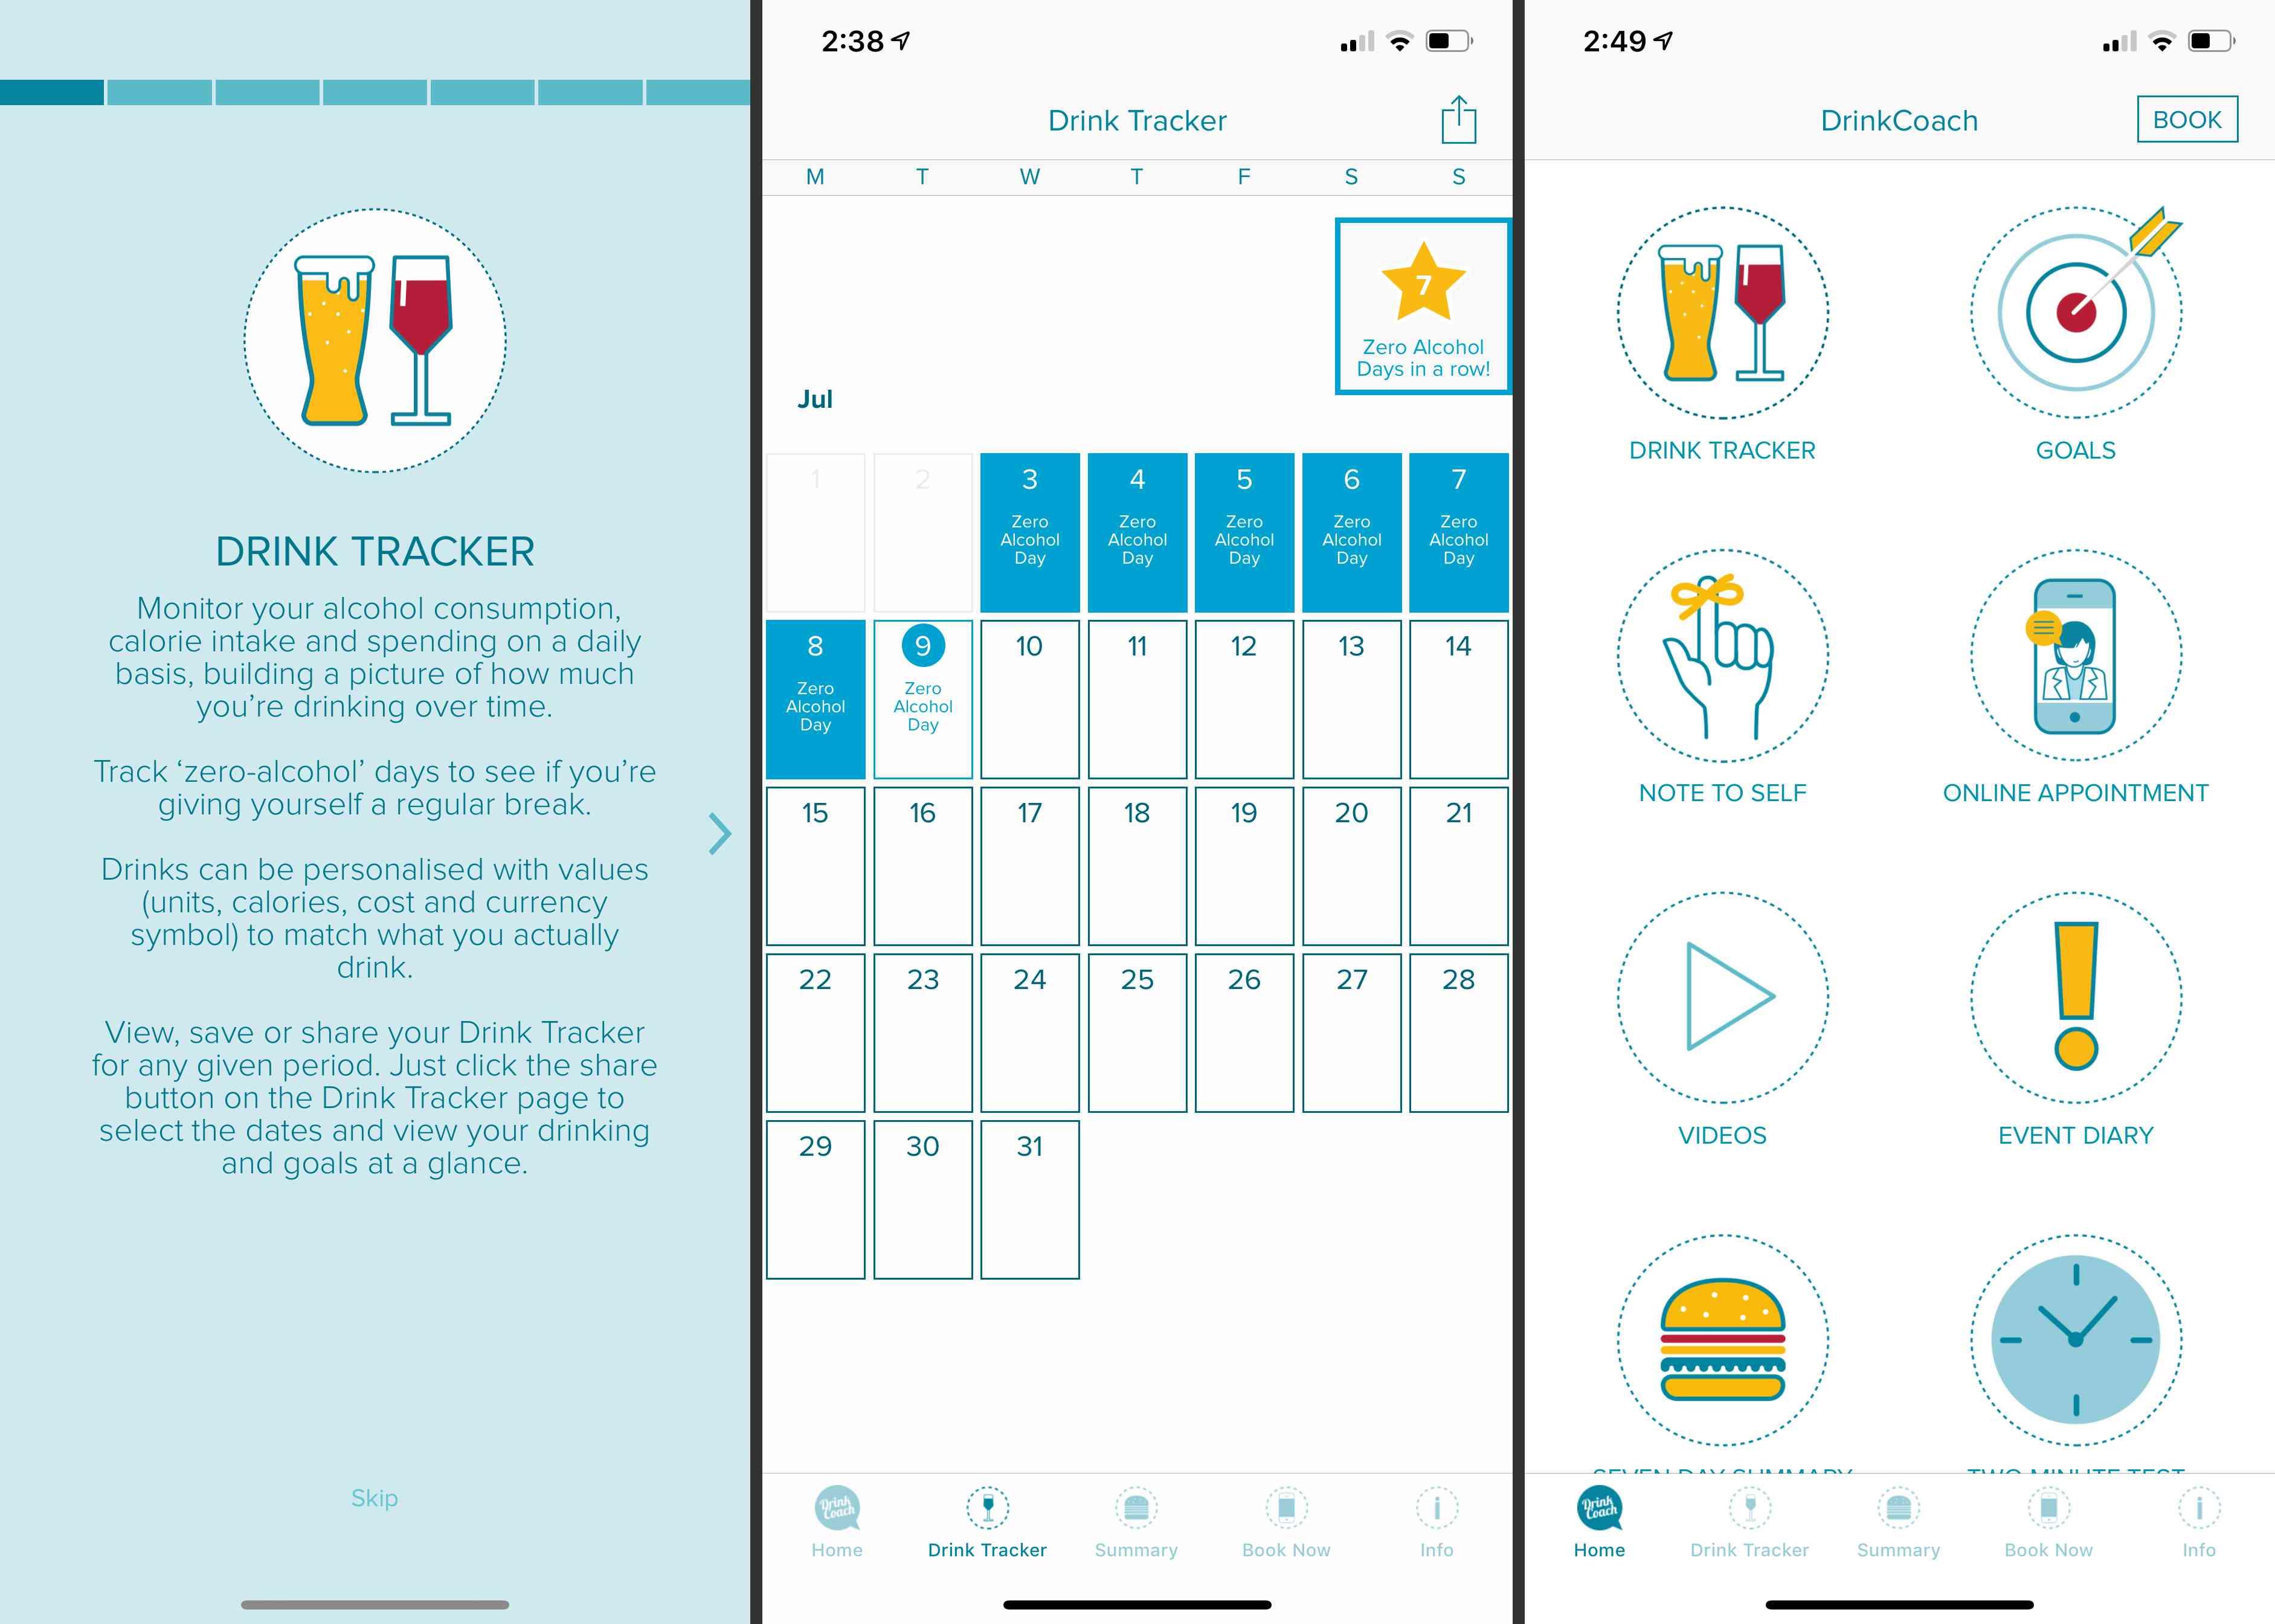 Drink Coach app